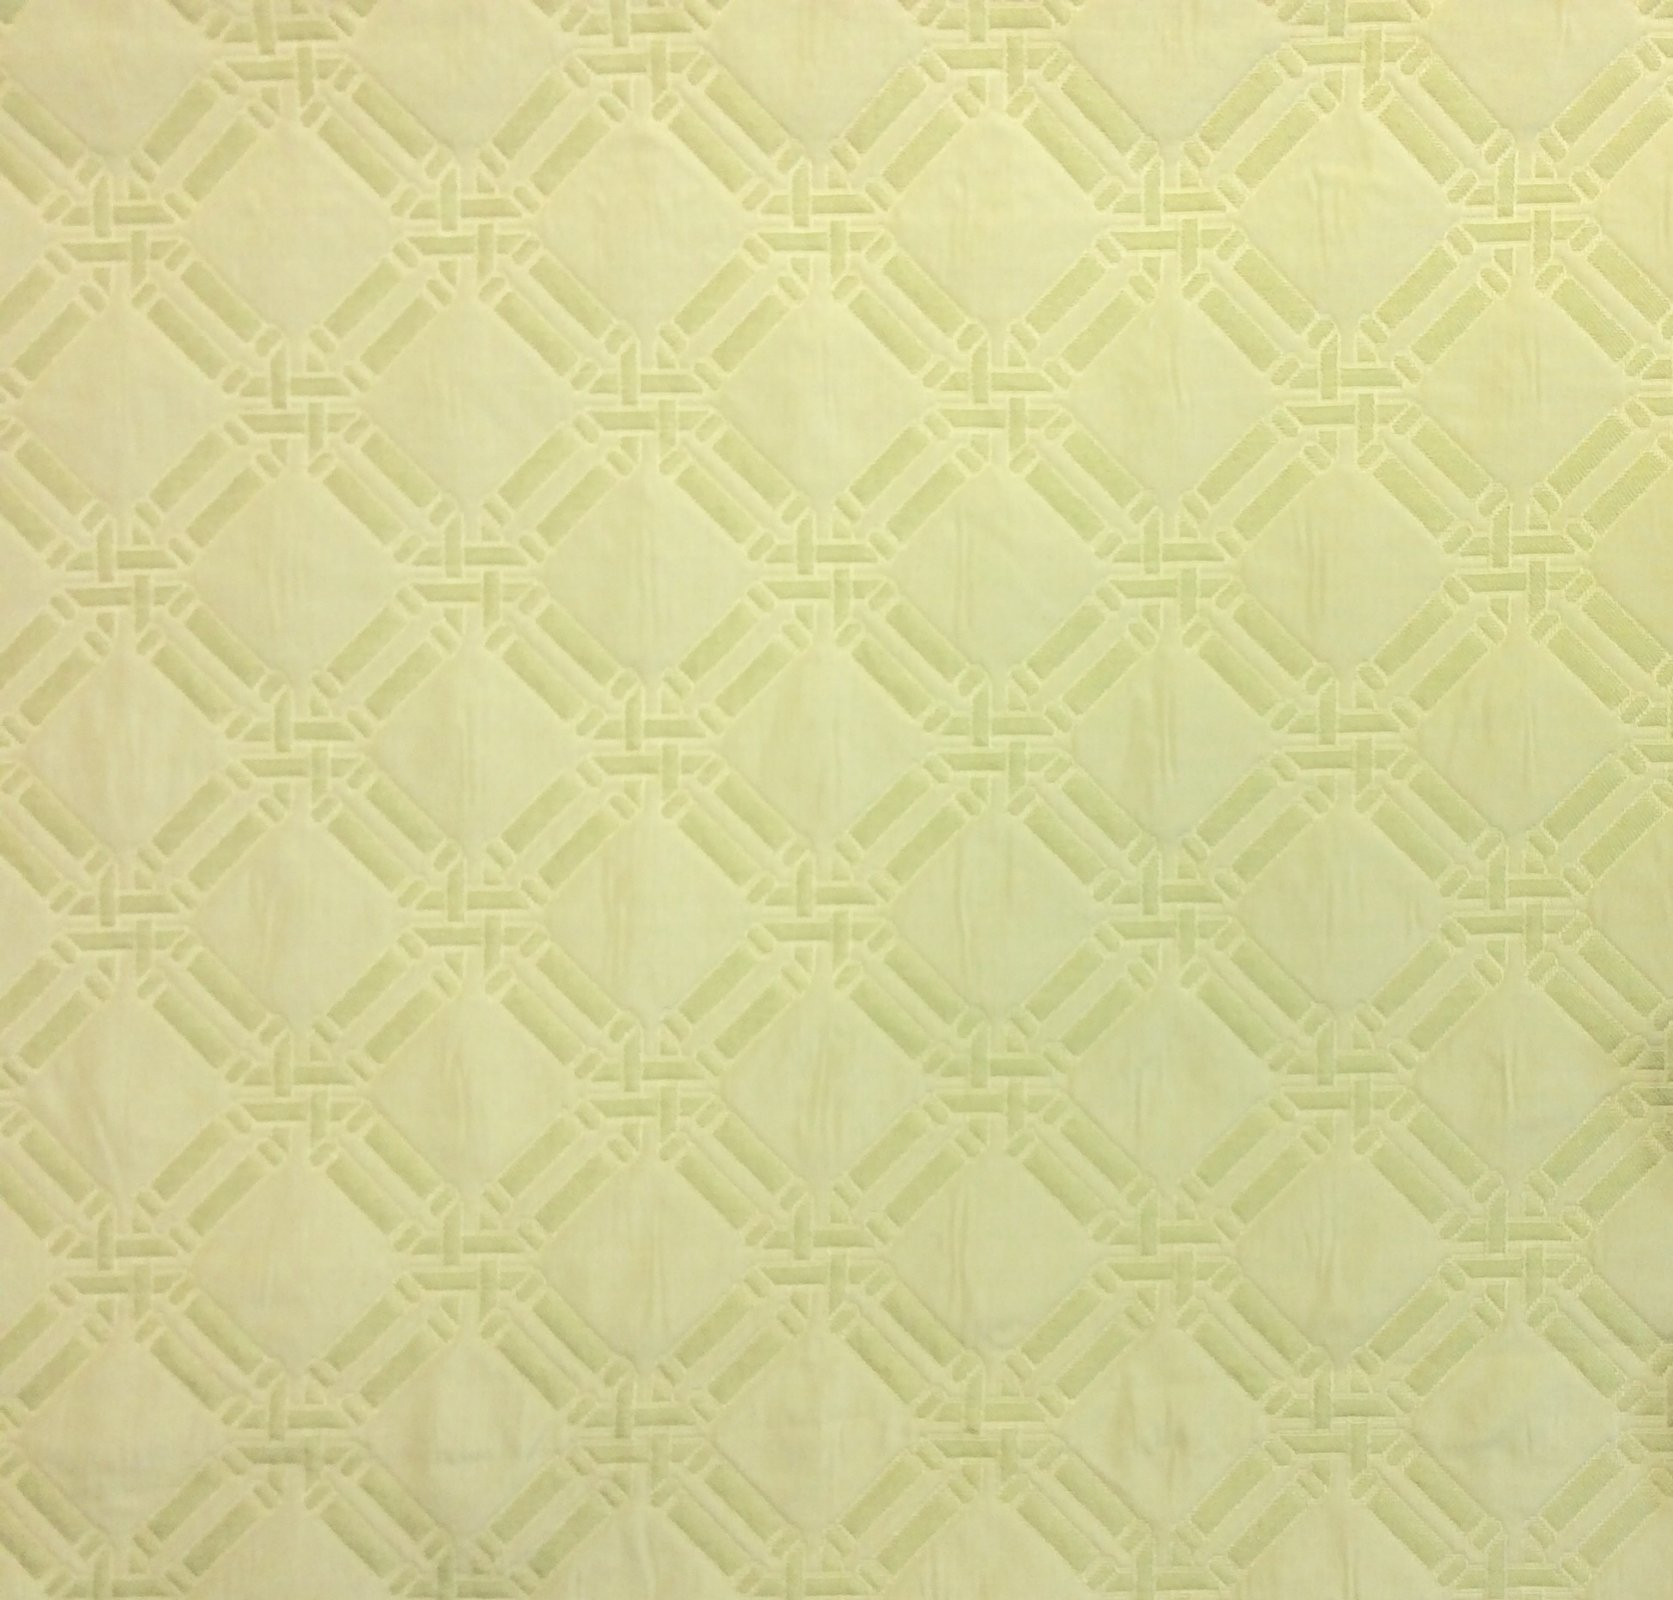 Pale Celery Green Bamboo Lattice Matelasse Light Upholstery Fabric LAT010